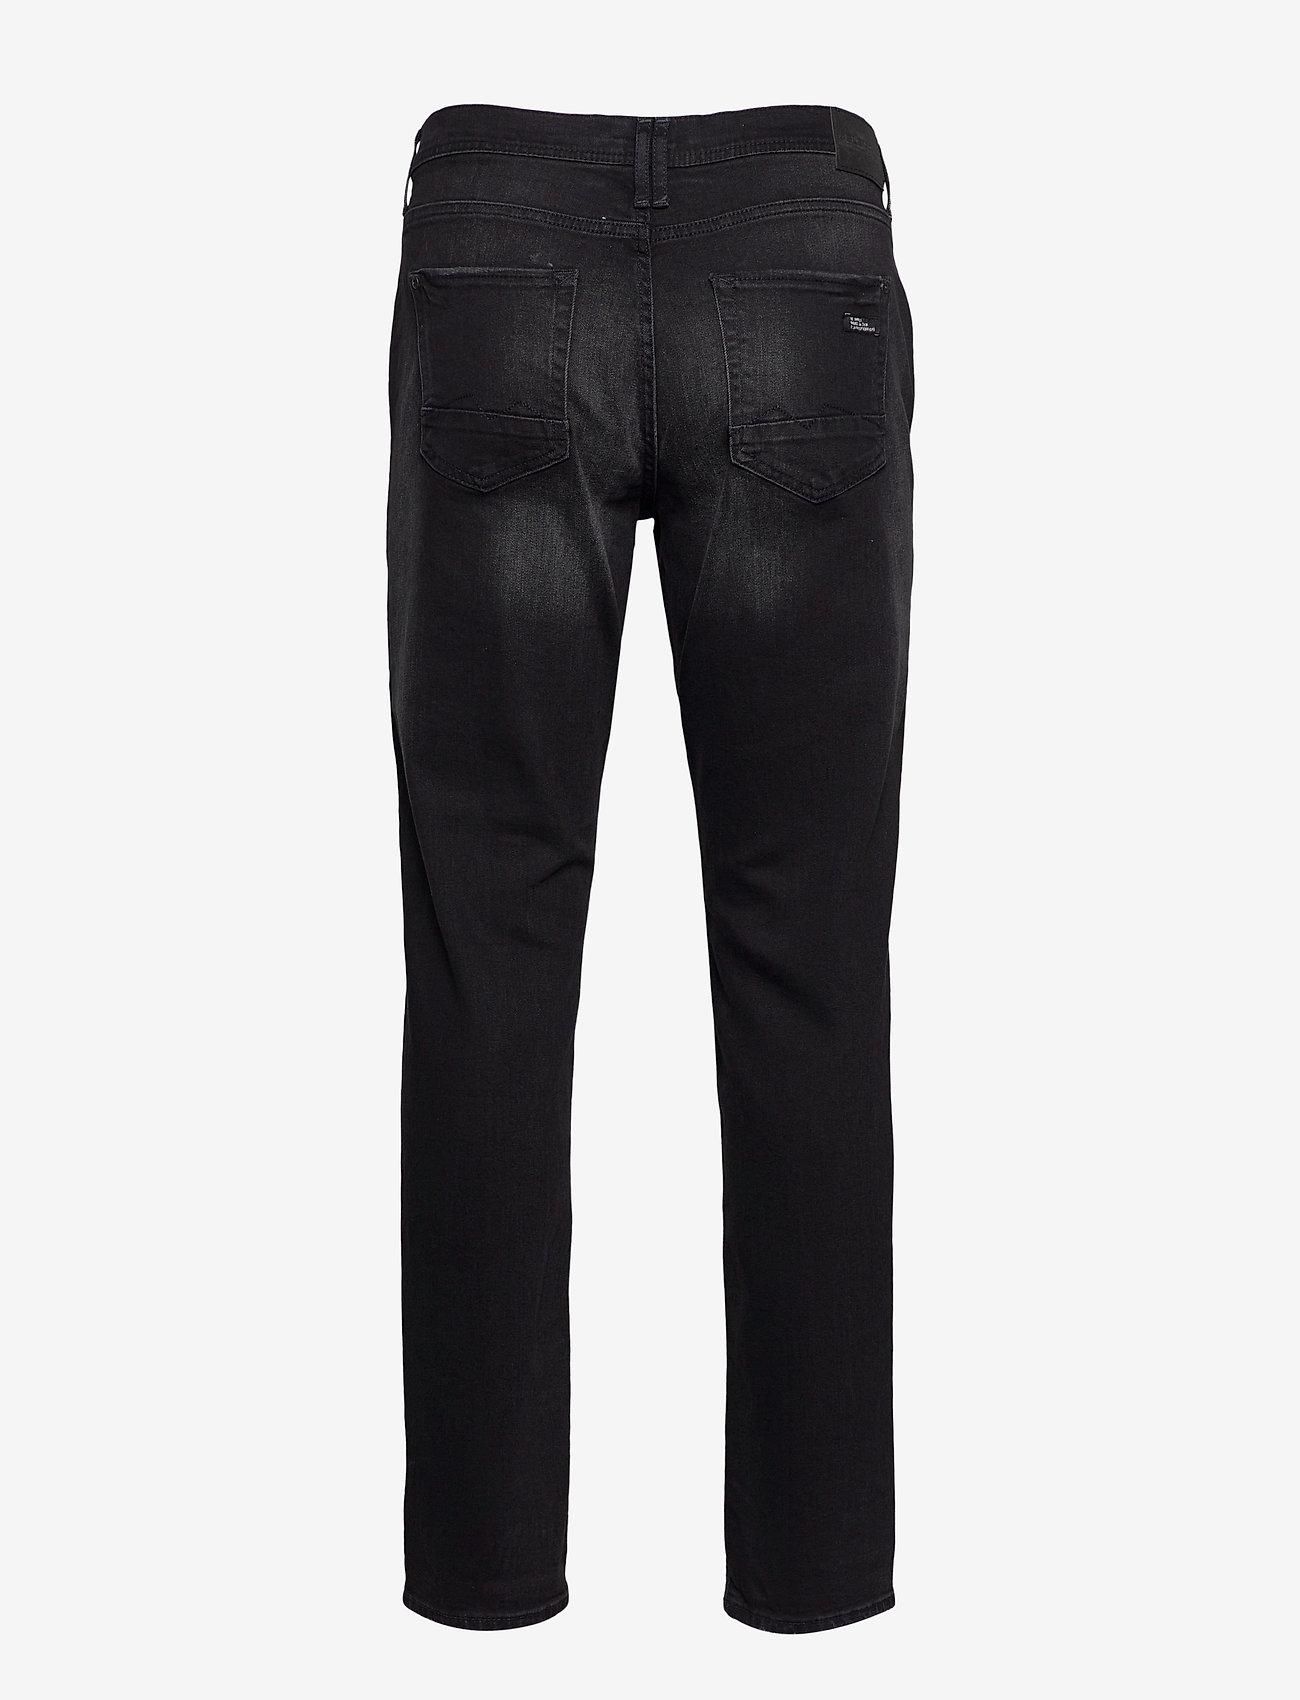 Blend - Jeans - Clean - slim jeans - denim black - 1